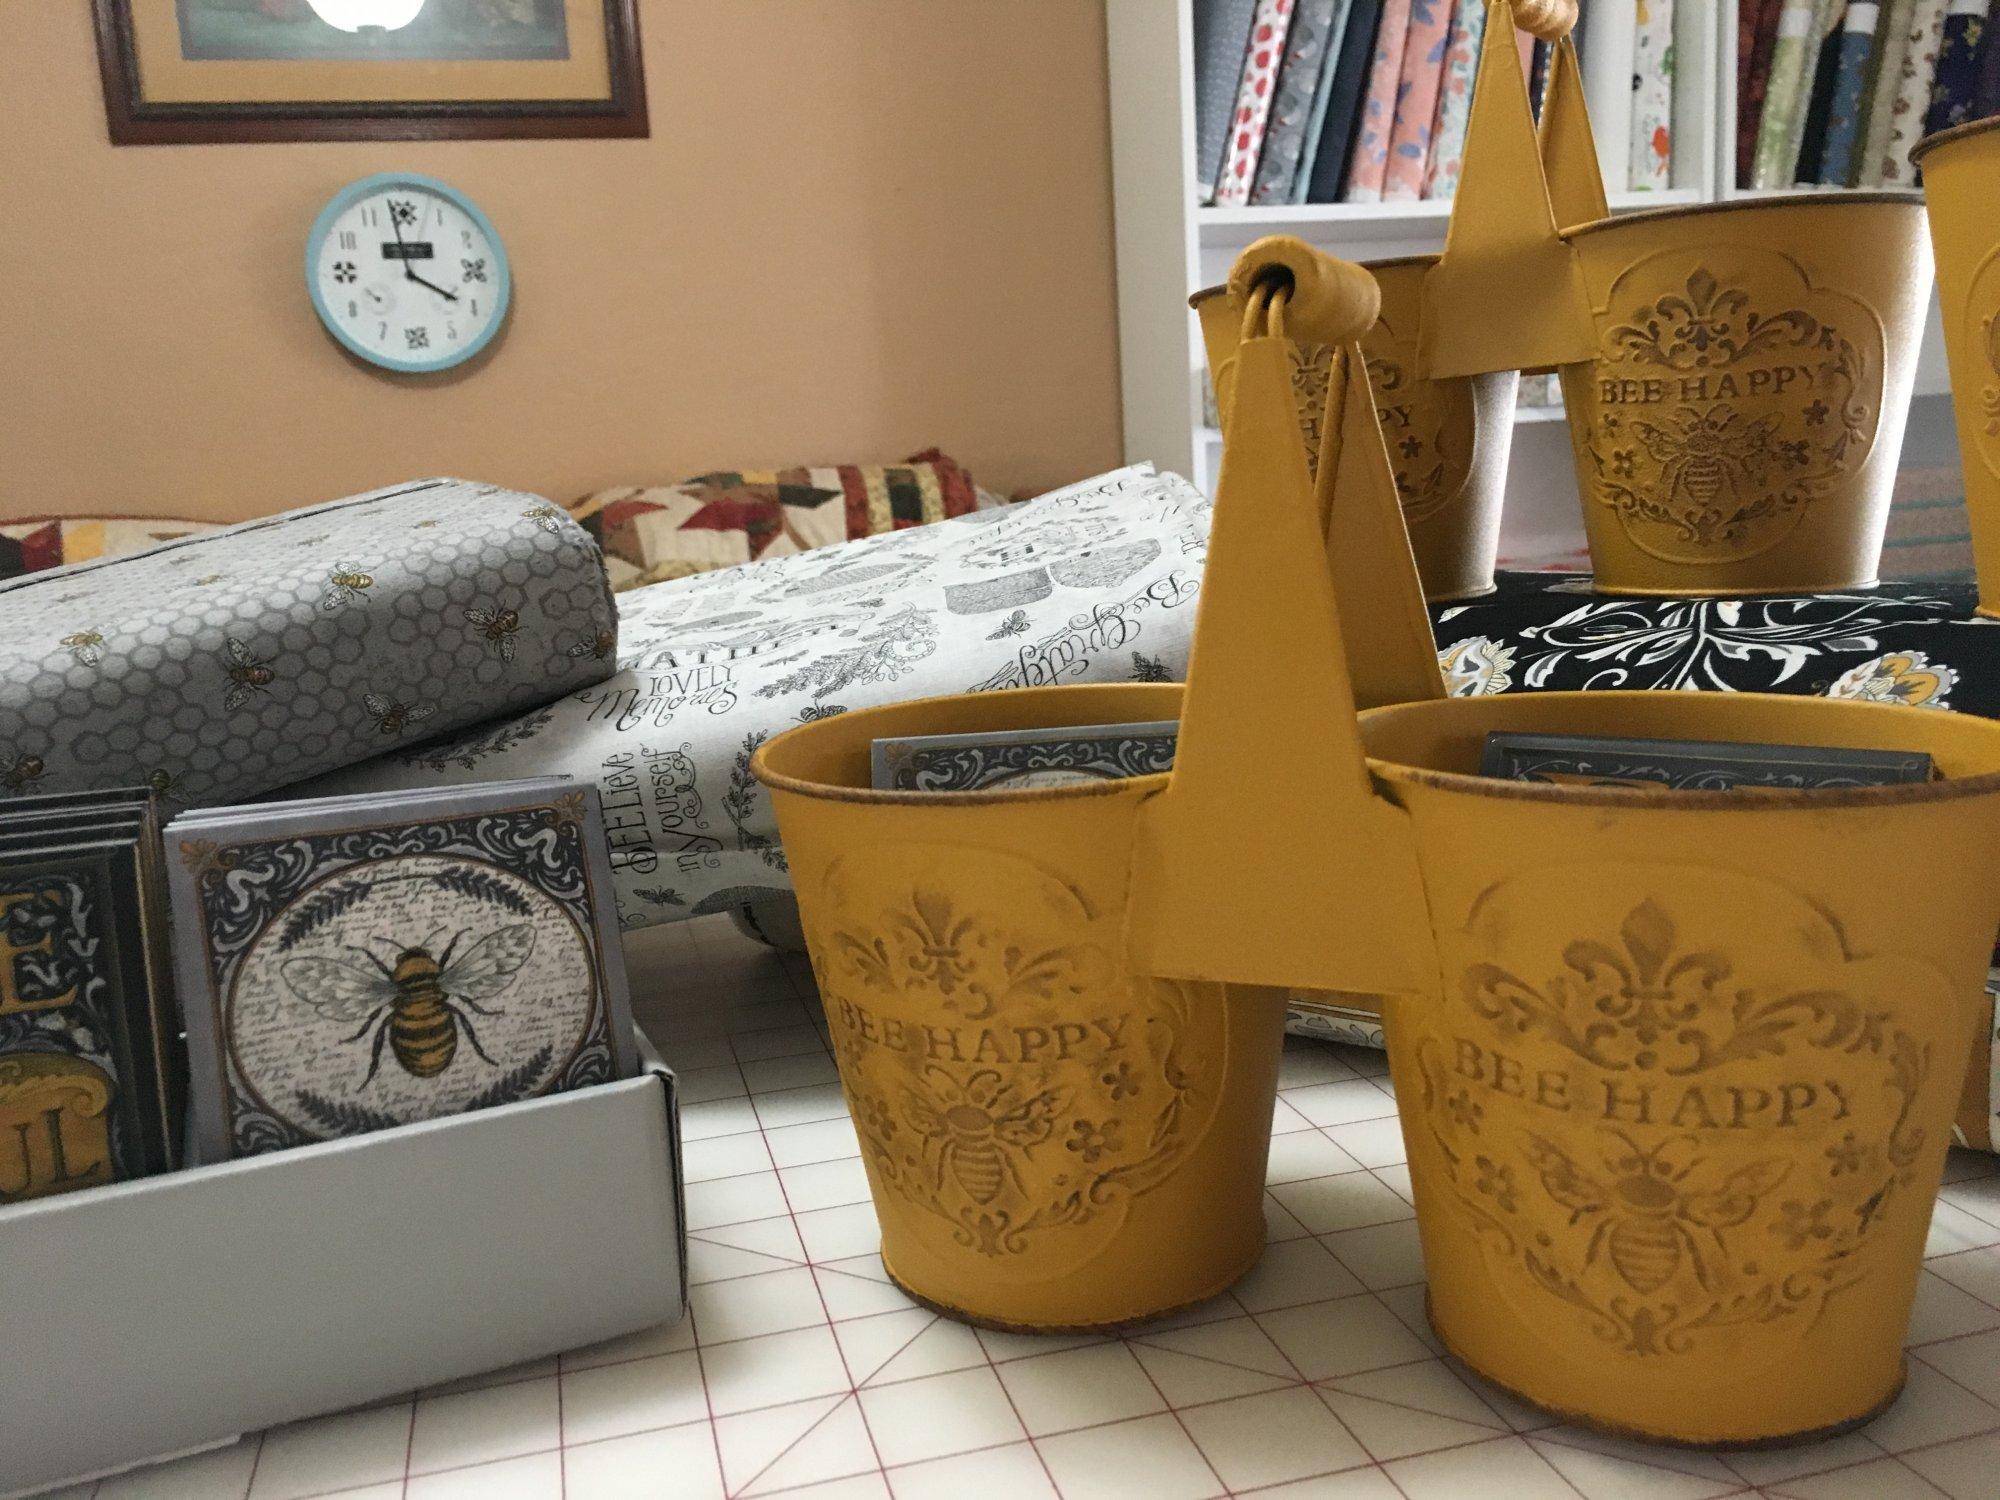 Bee Joyful Divided Tin designed by Deb Strain for Moda